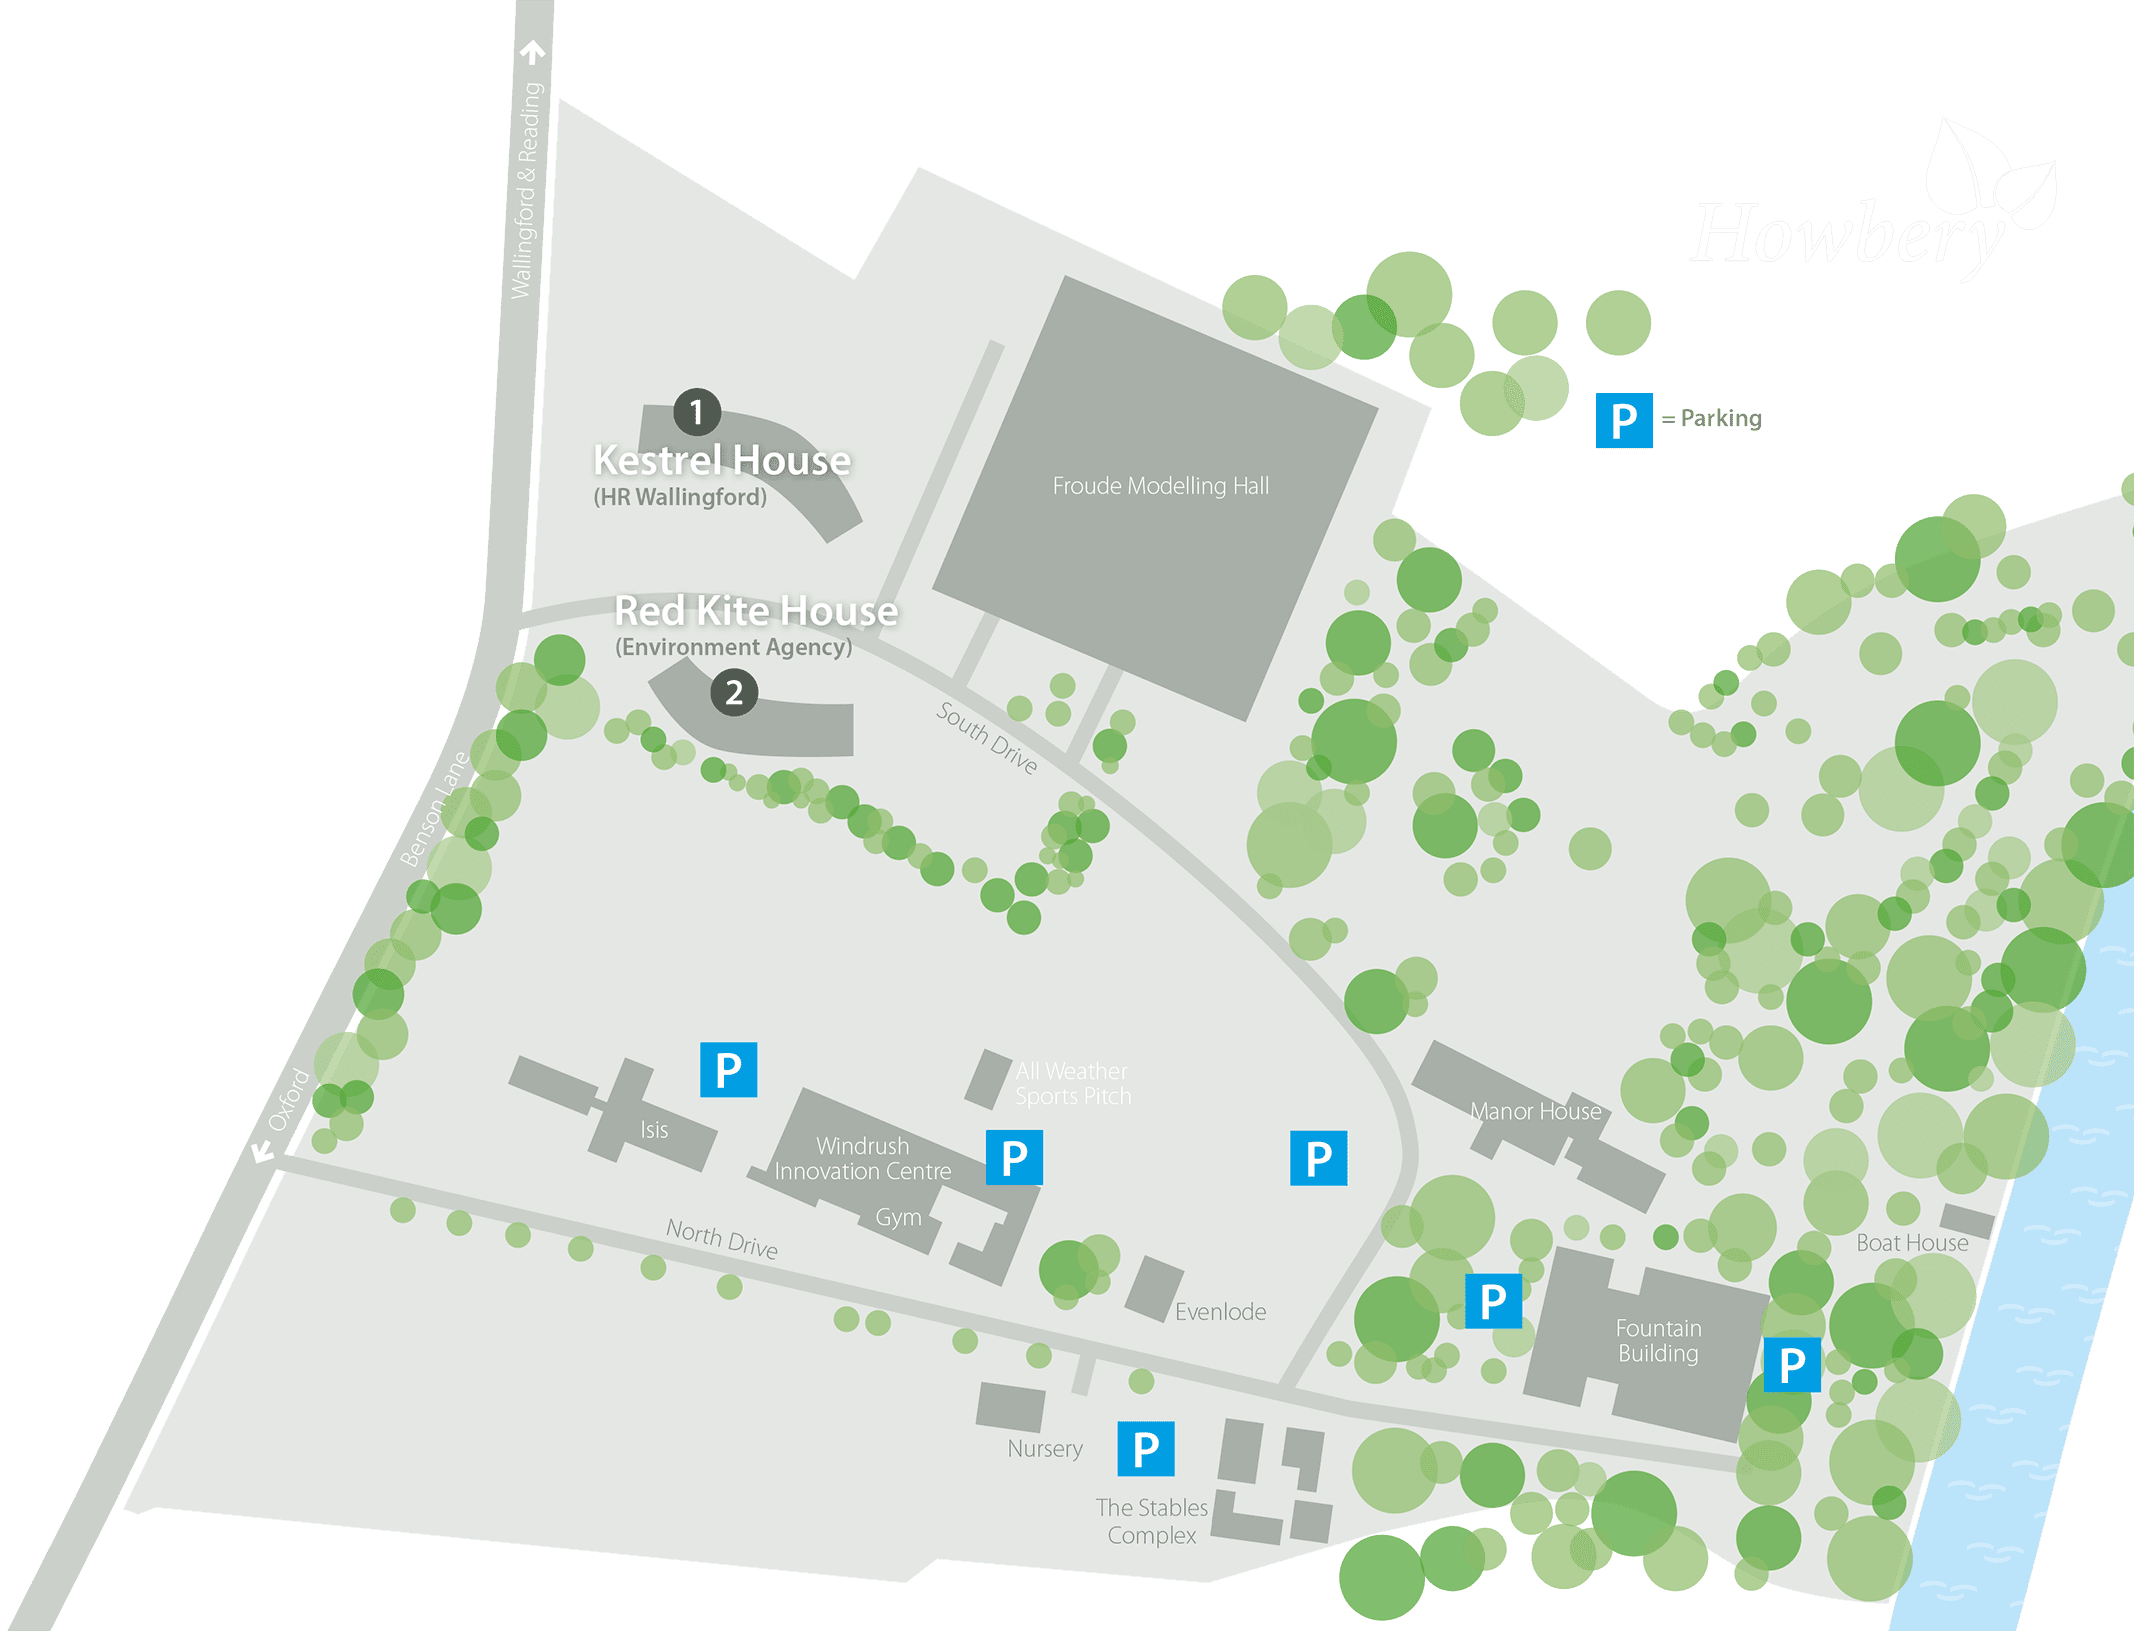 howbery-parking-plan